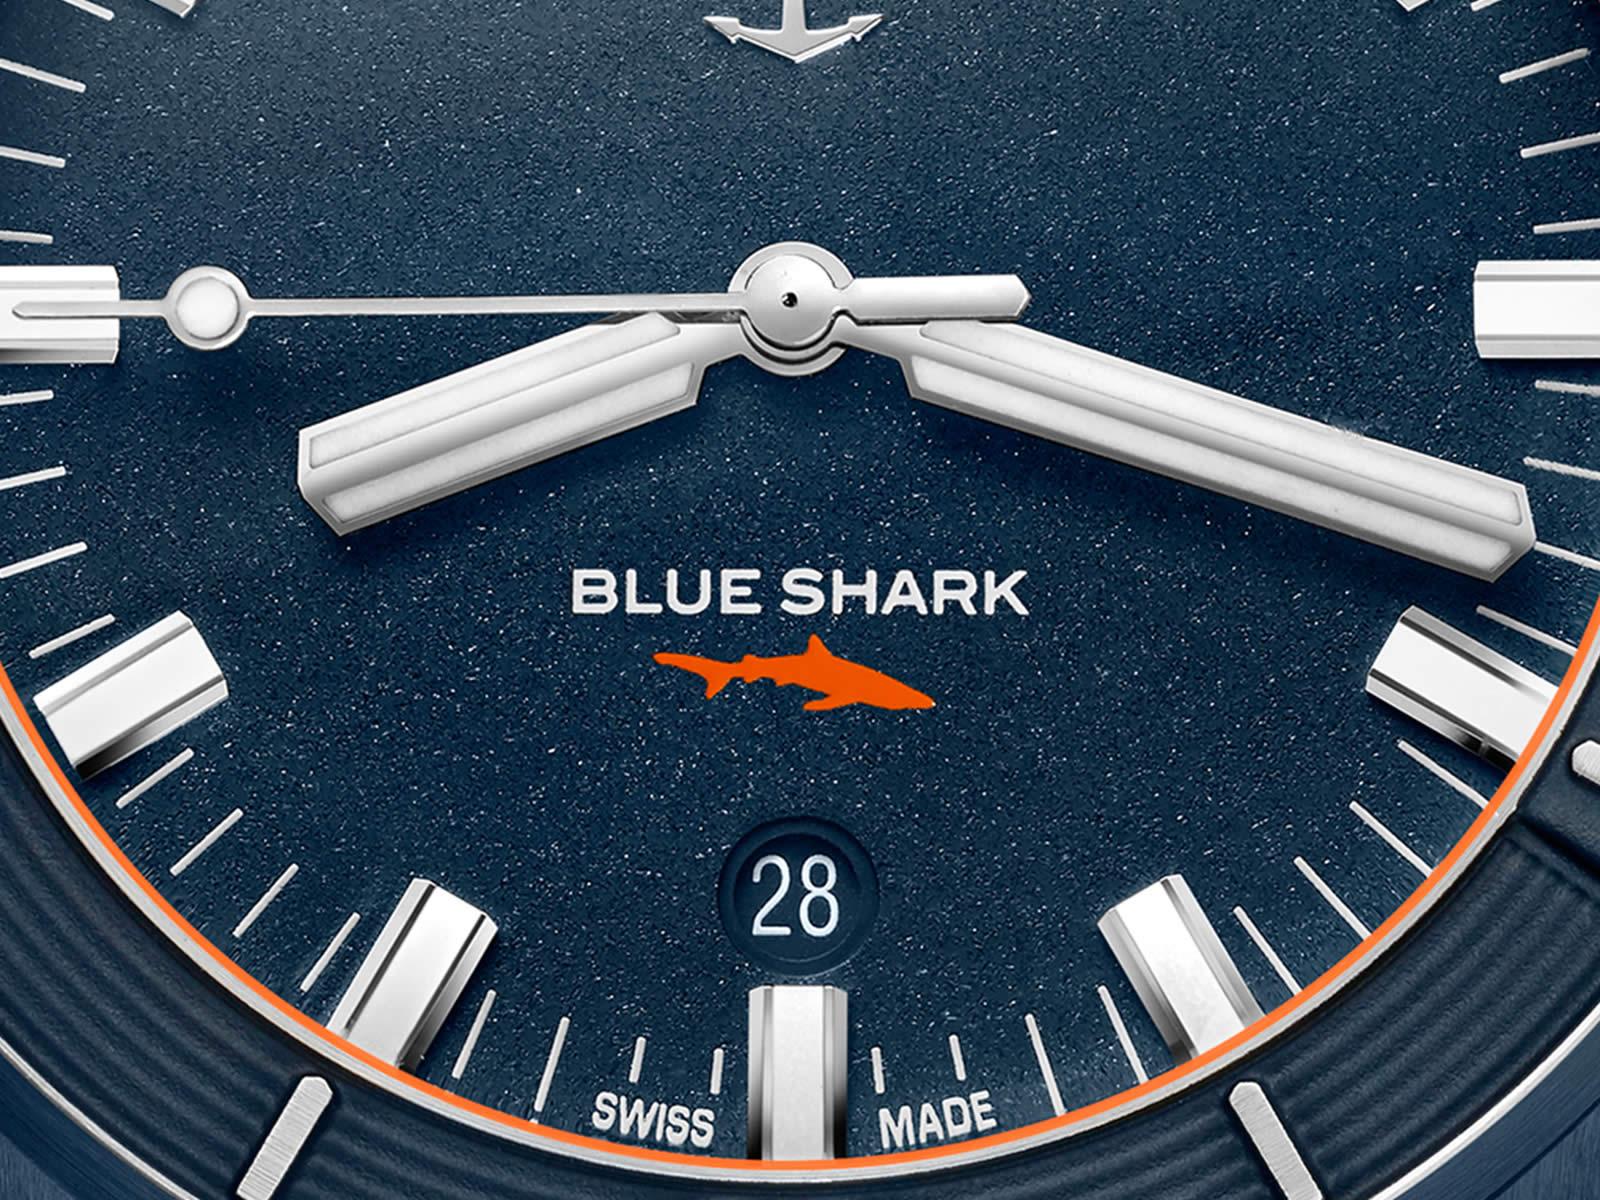 8163-175le-93-blueshark-ulysse-nardin-diver-42mm-2-.jpg